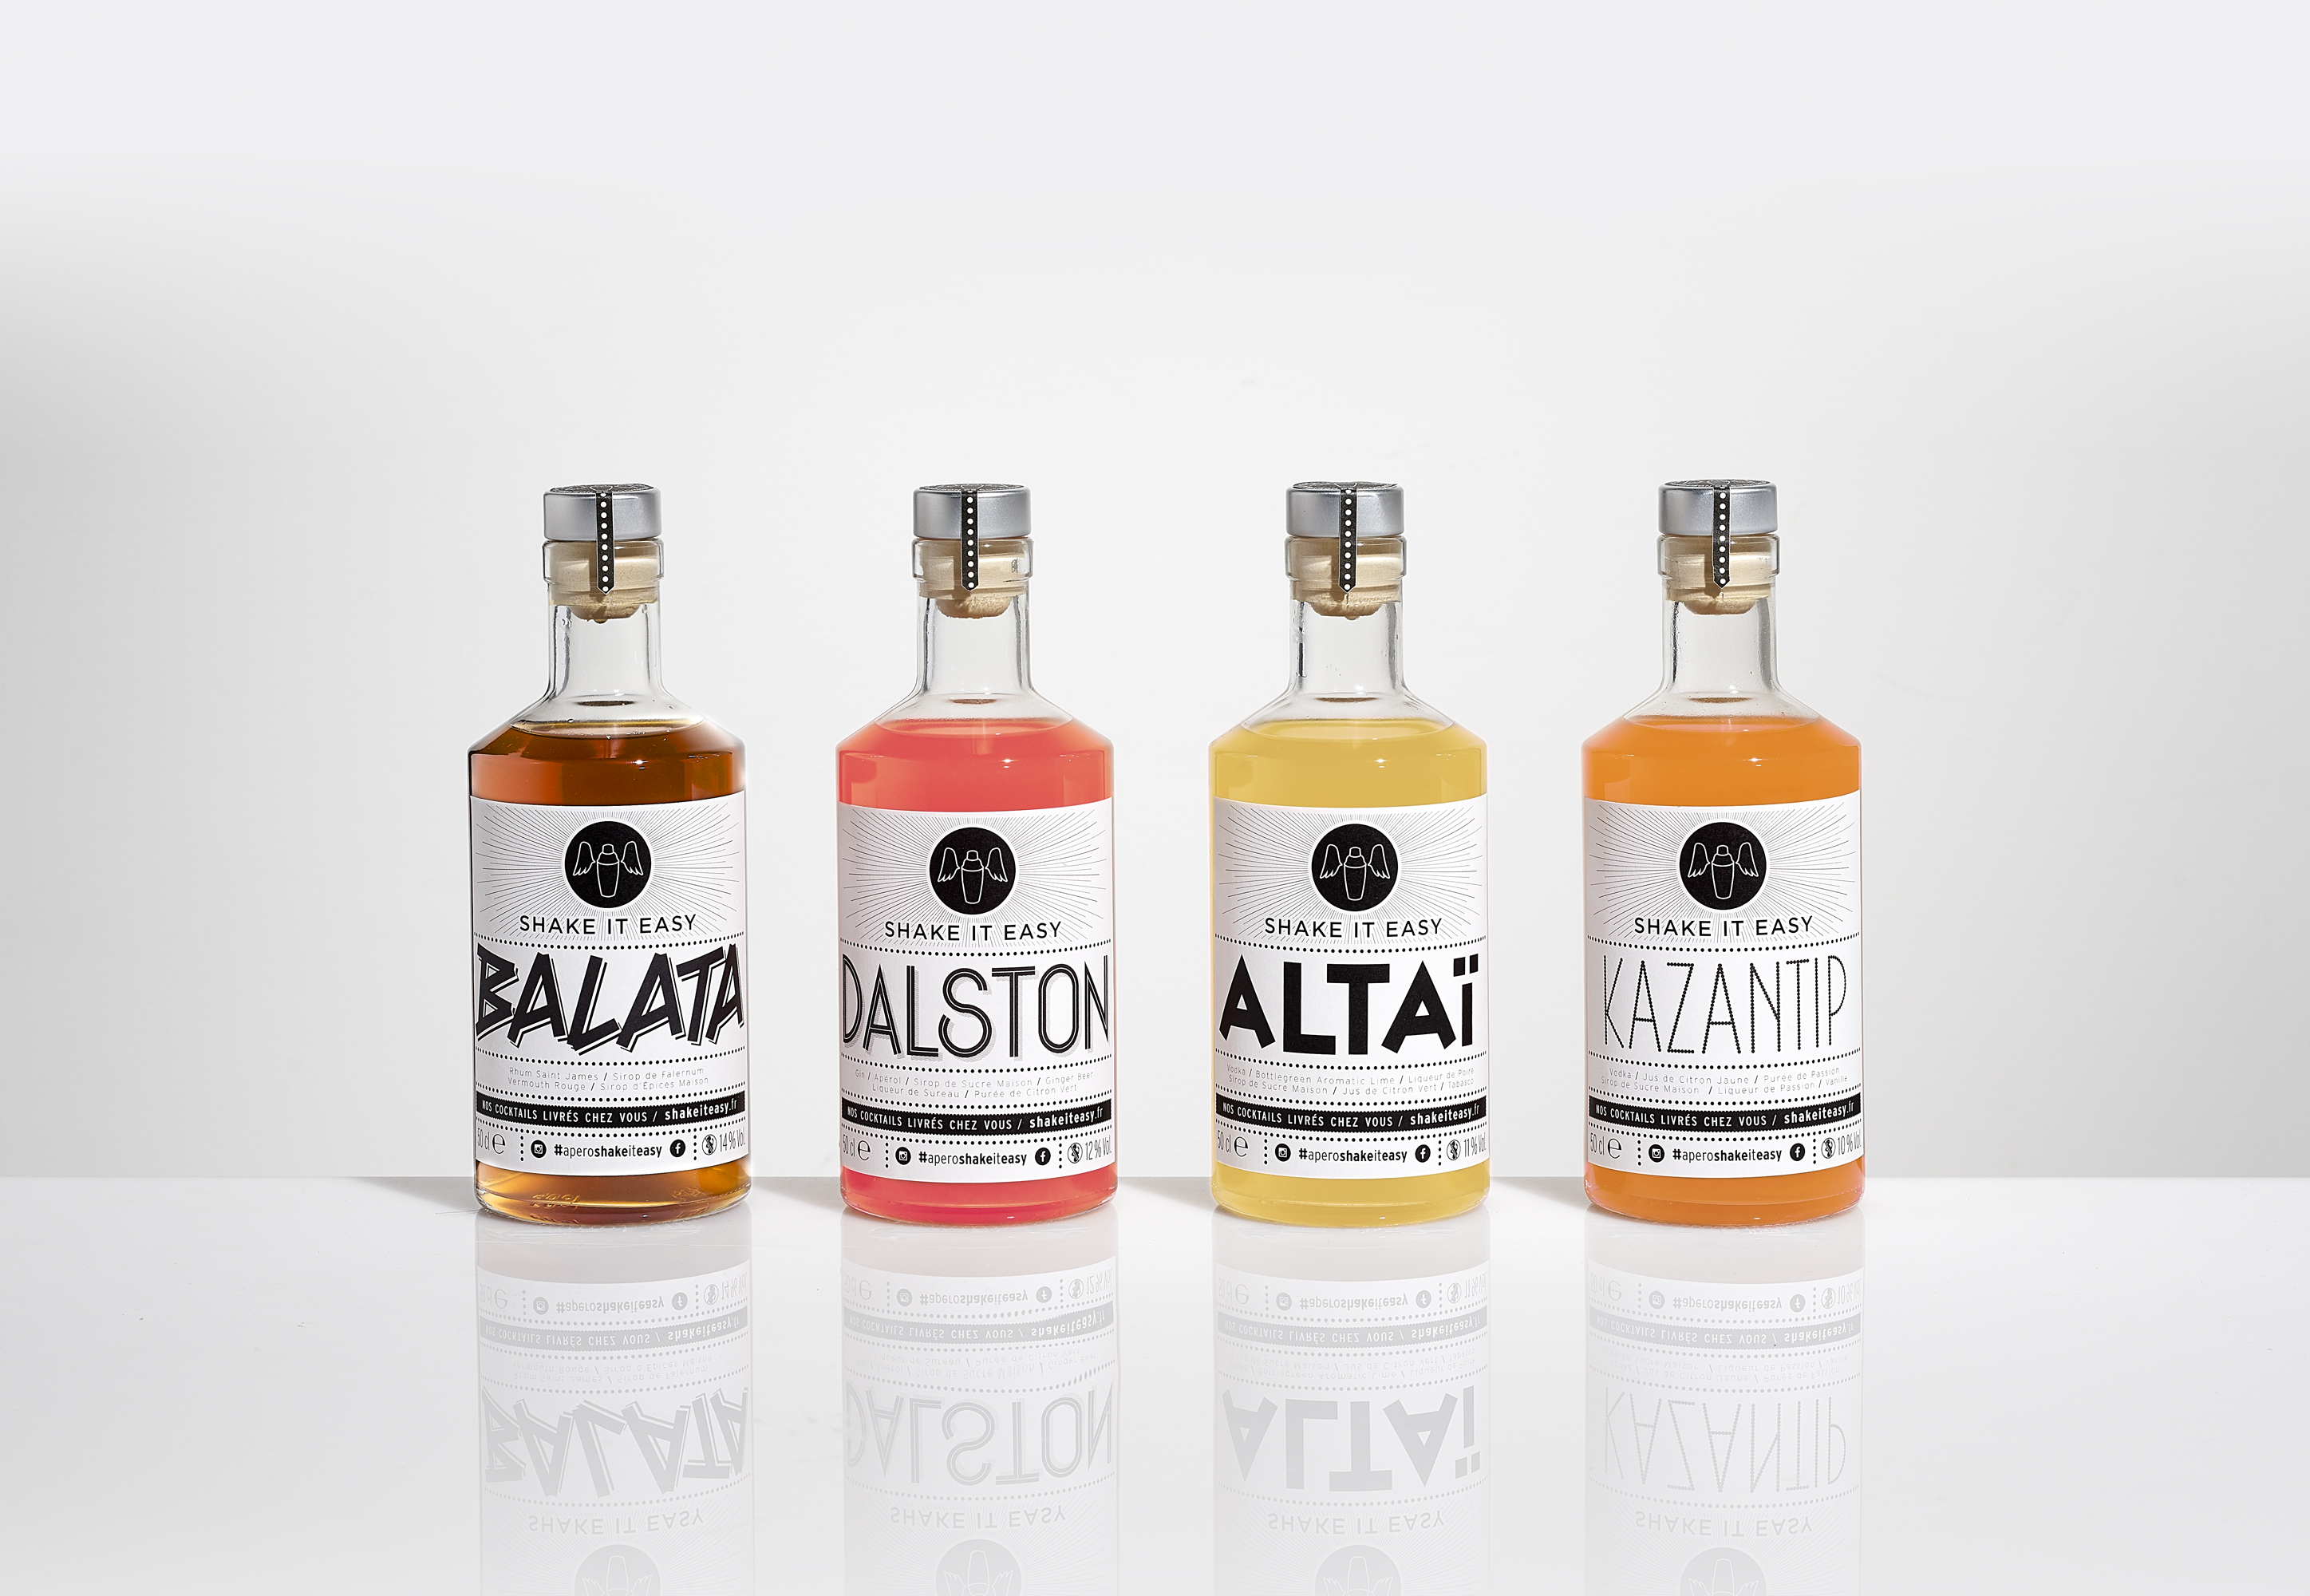 laboitedallumettes-shakeiteasy-allumettes-paris-cocktails-easy-boisson-service-commande-livraison-paulette